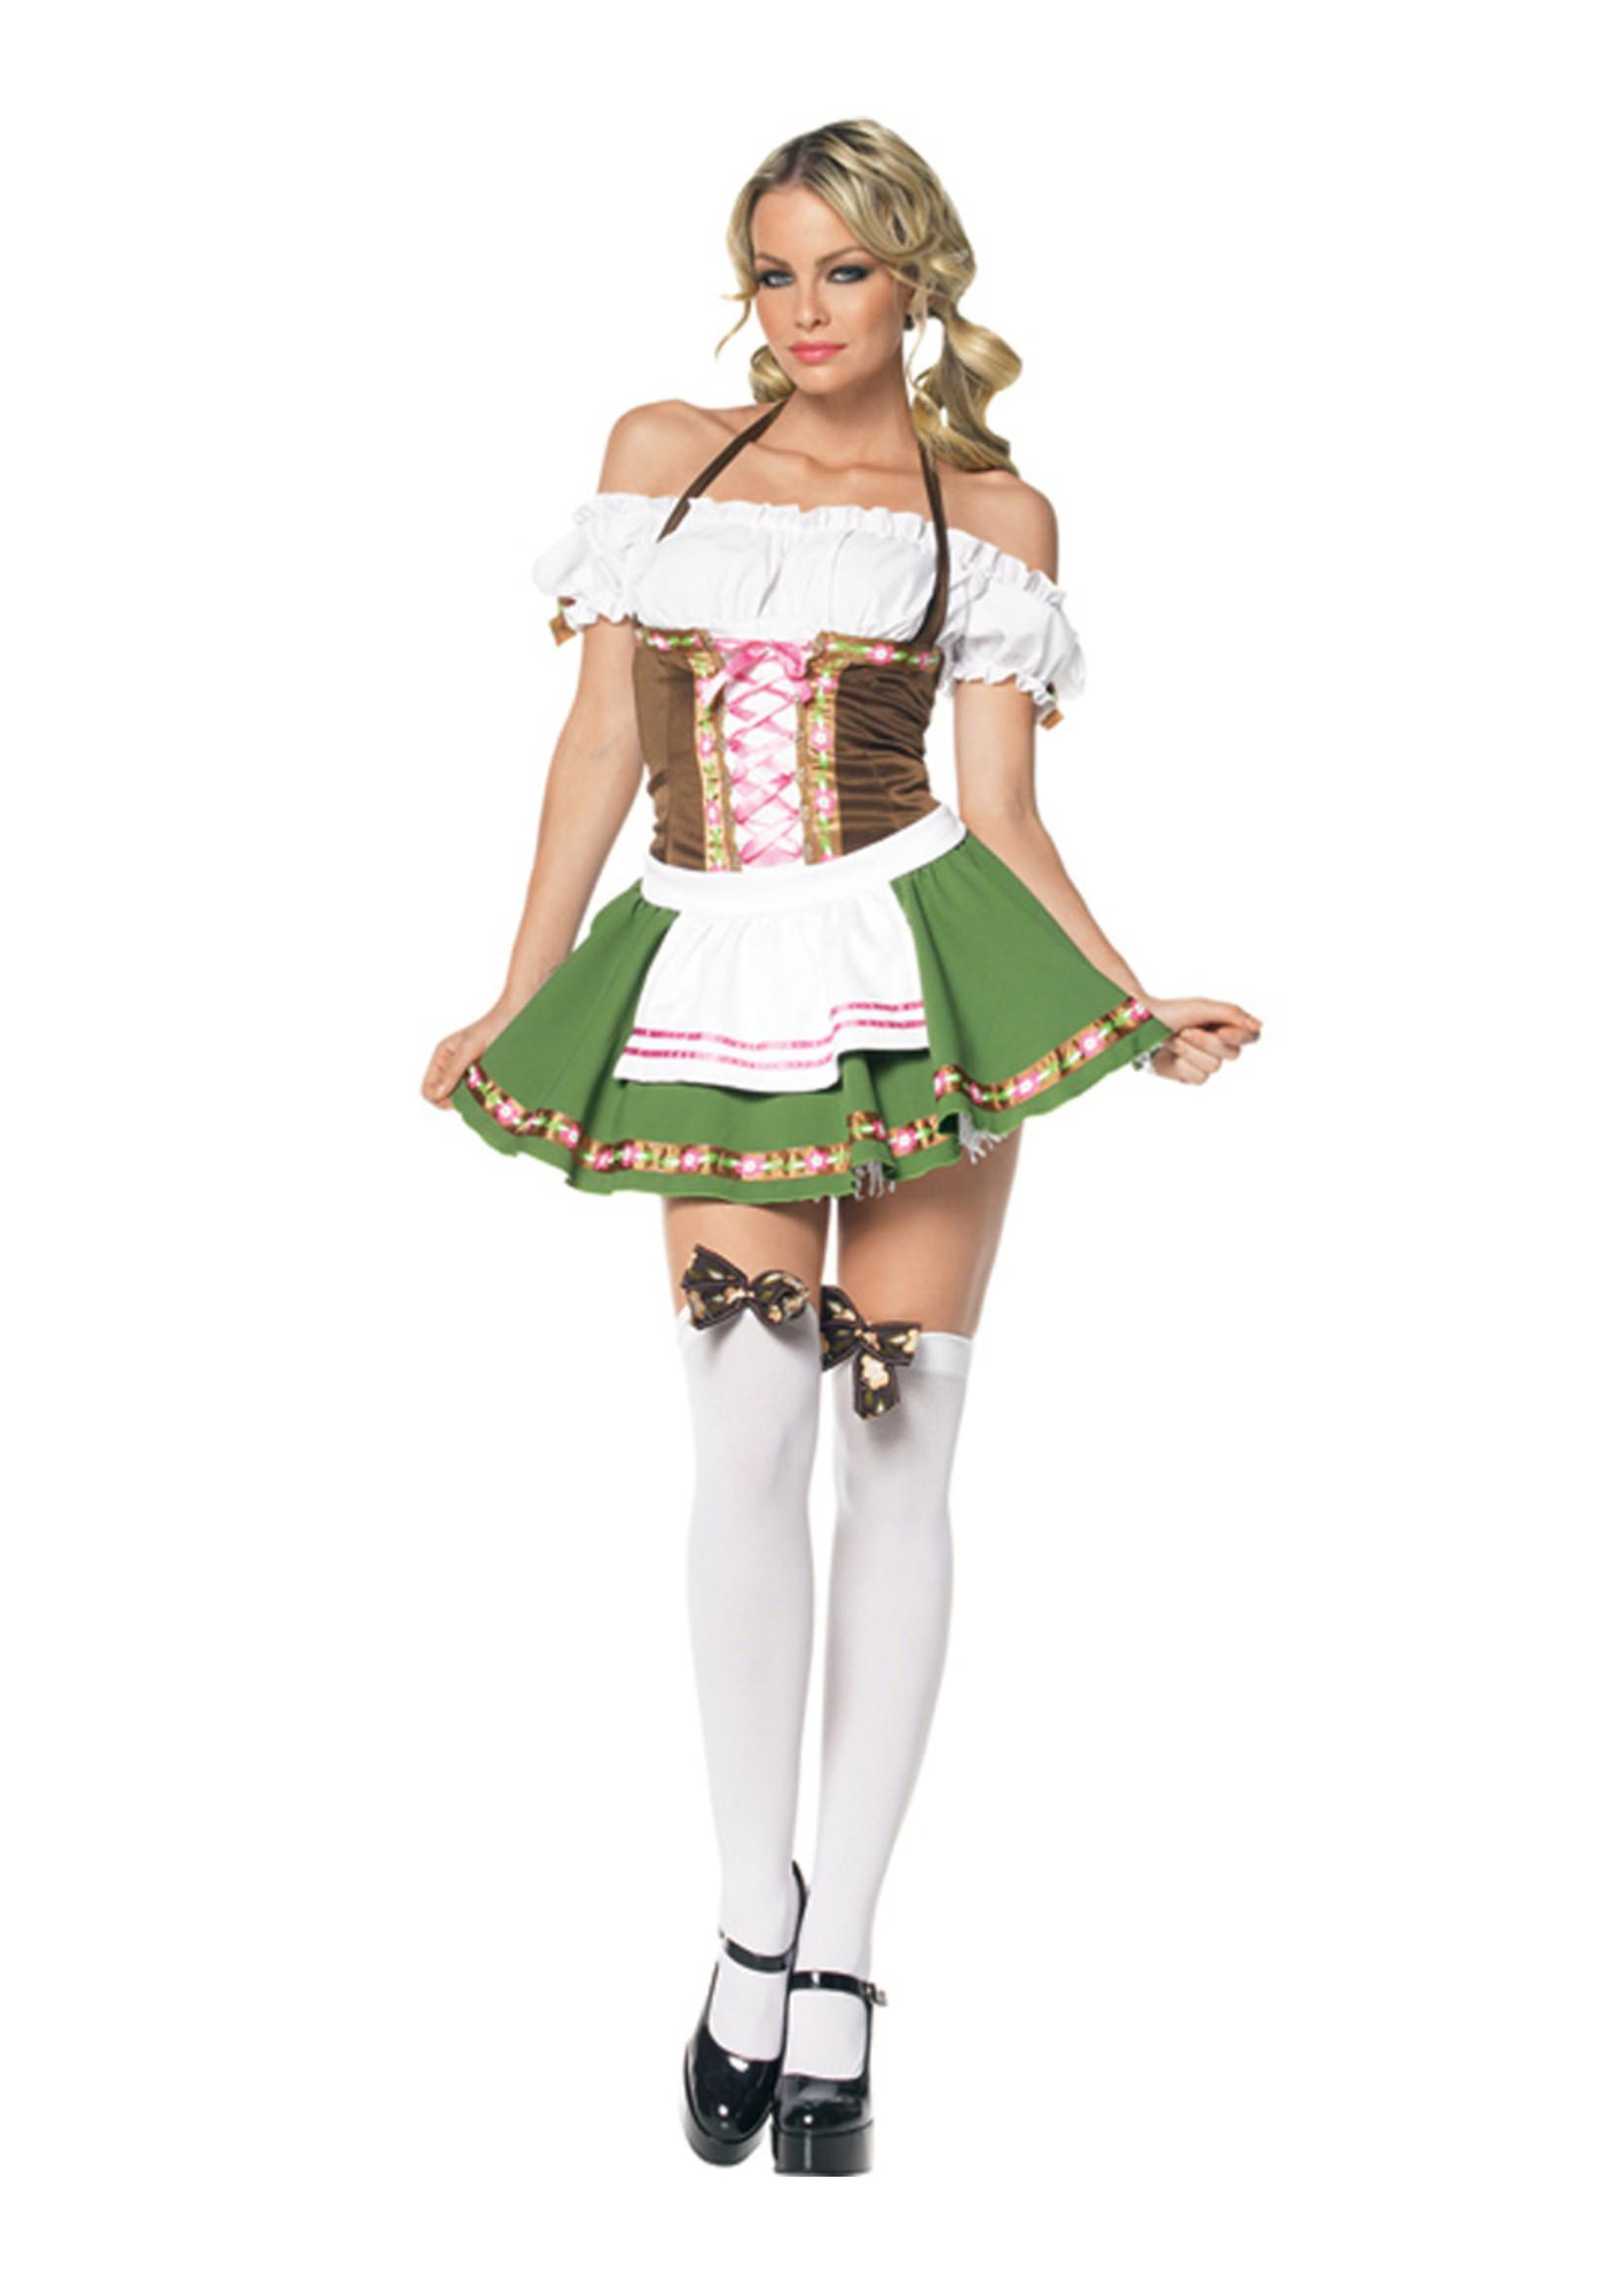 LEG AVENUE Gretchen Costume - Women's